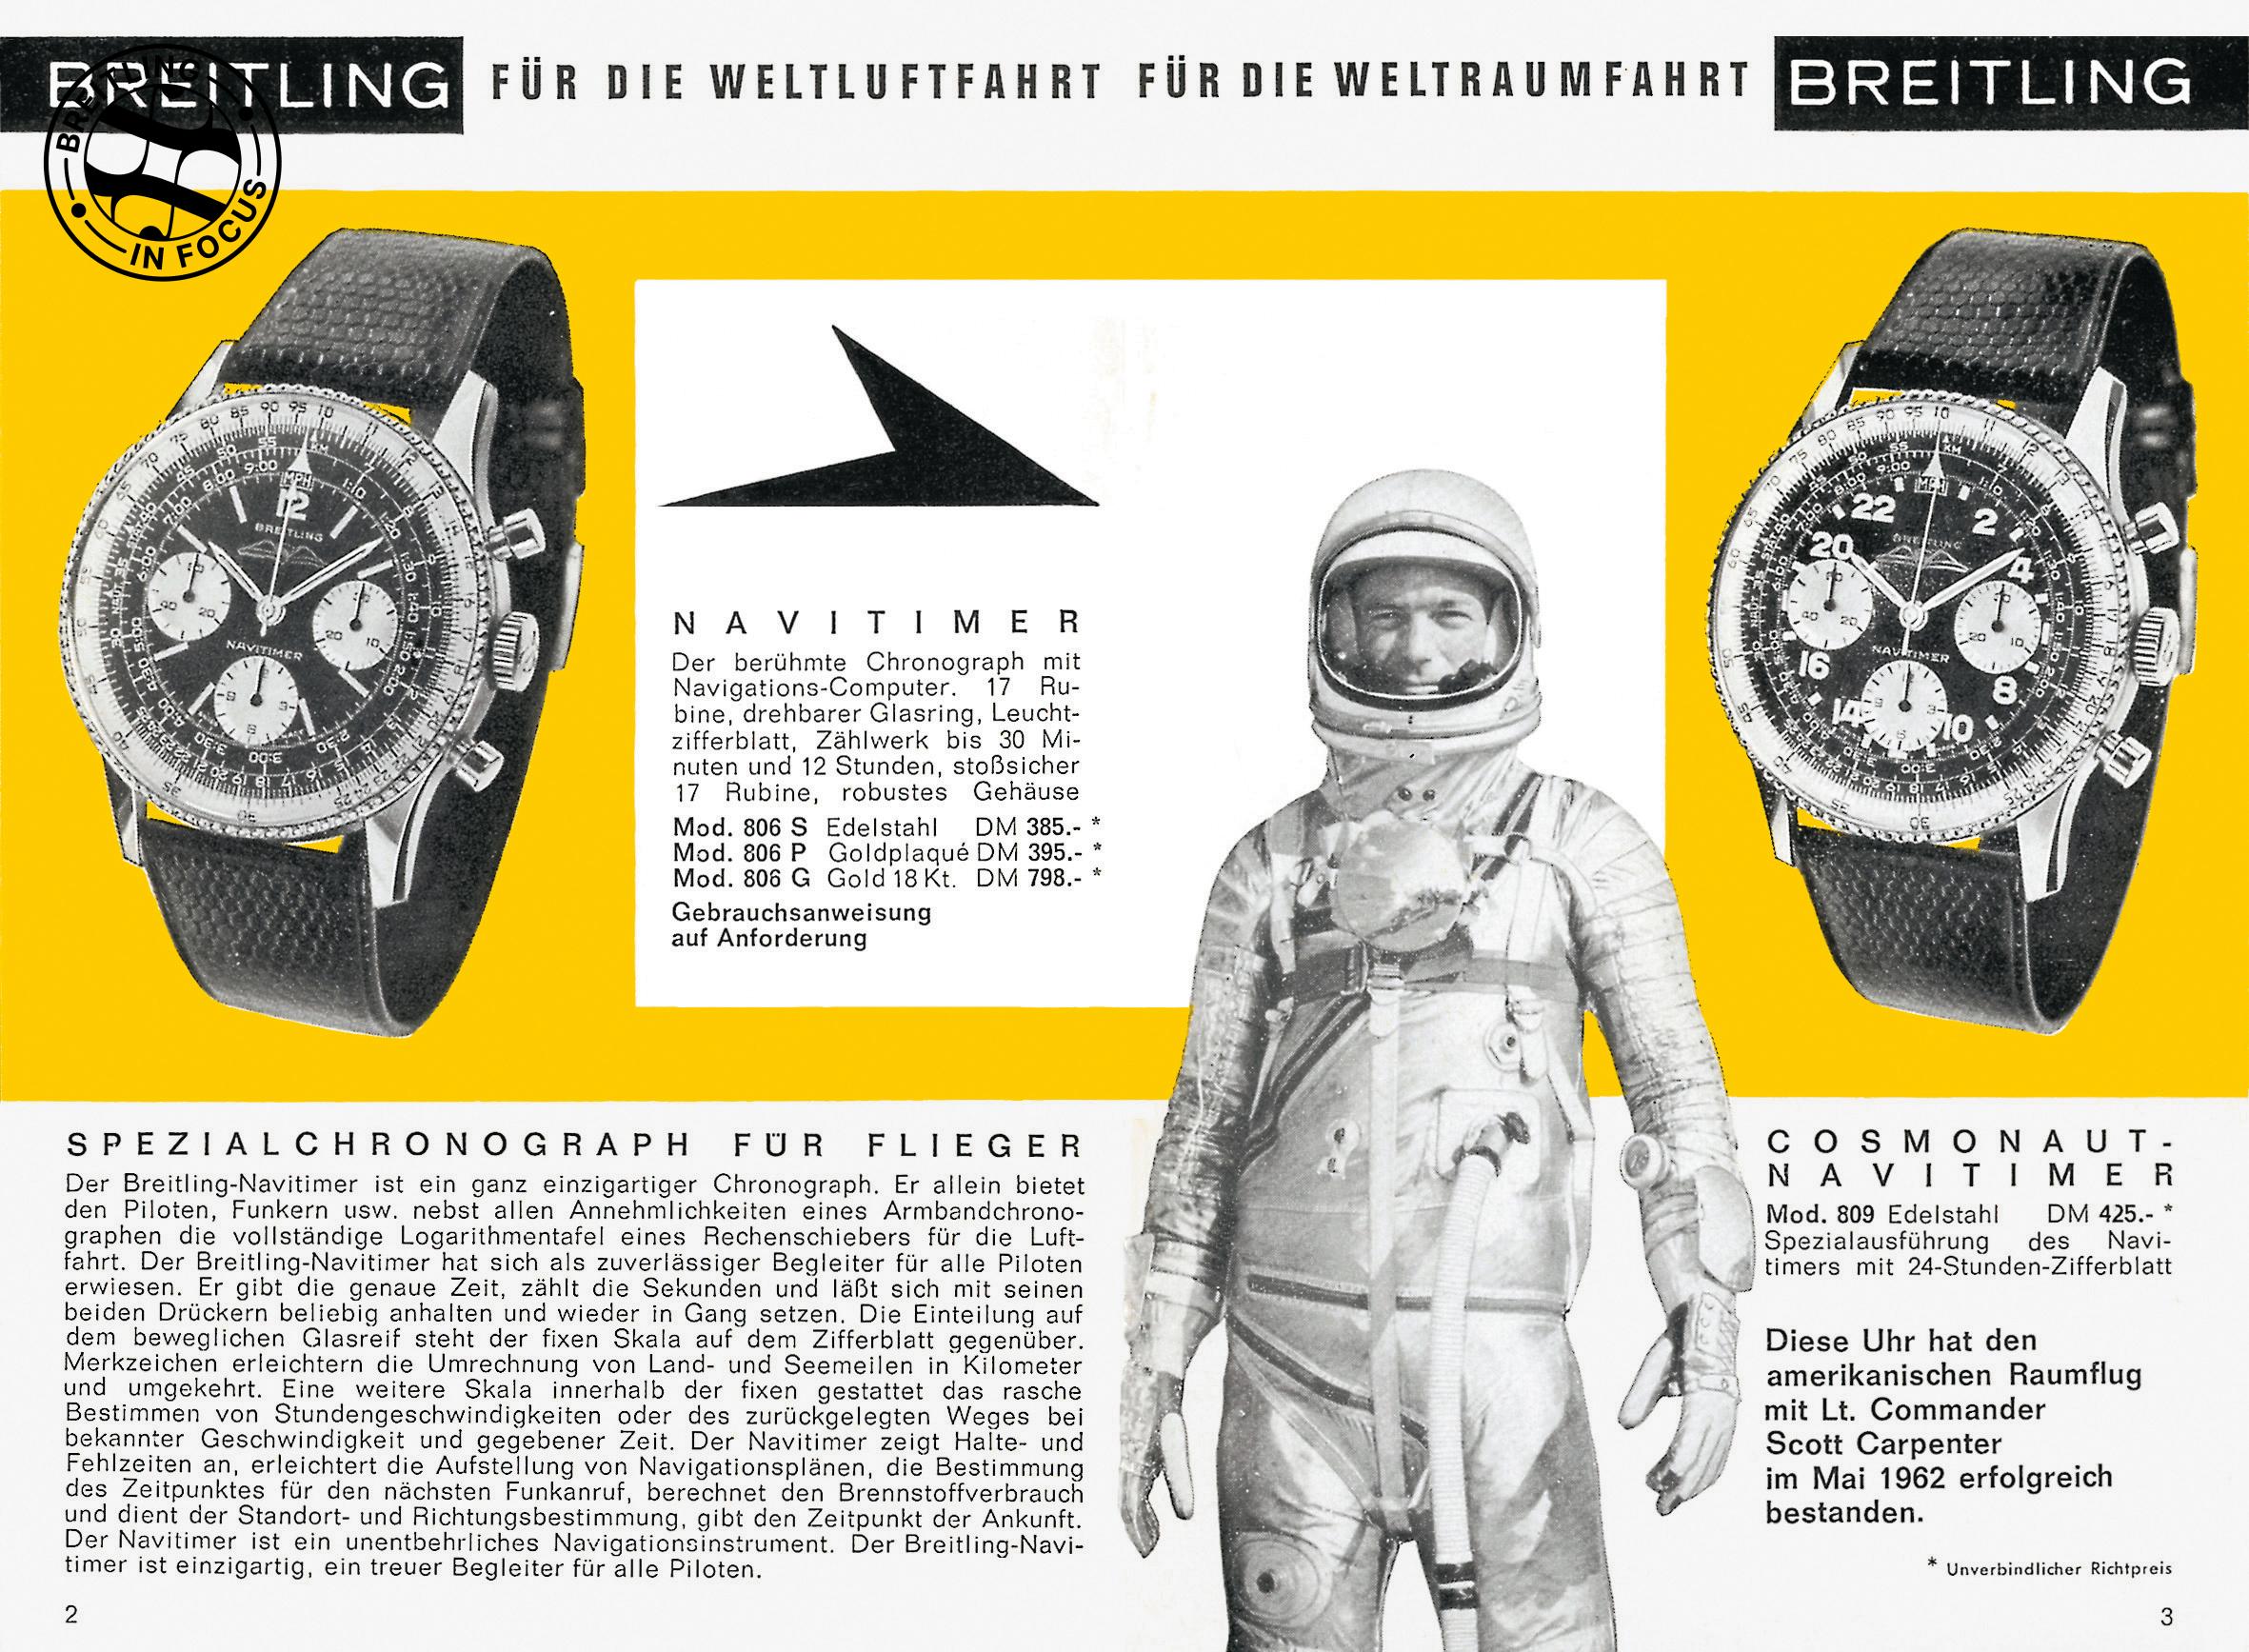 NASA astronaut Scott Carpenter wore a Breitling in space